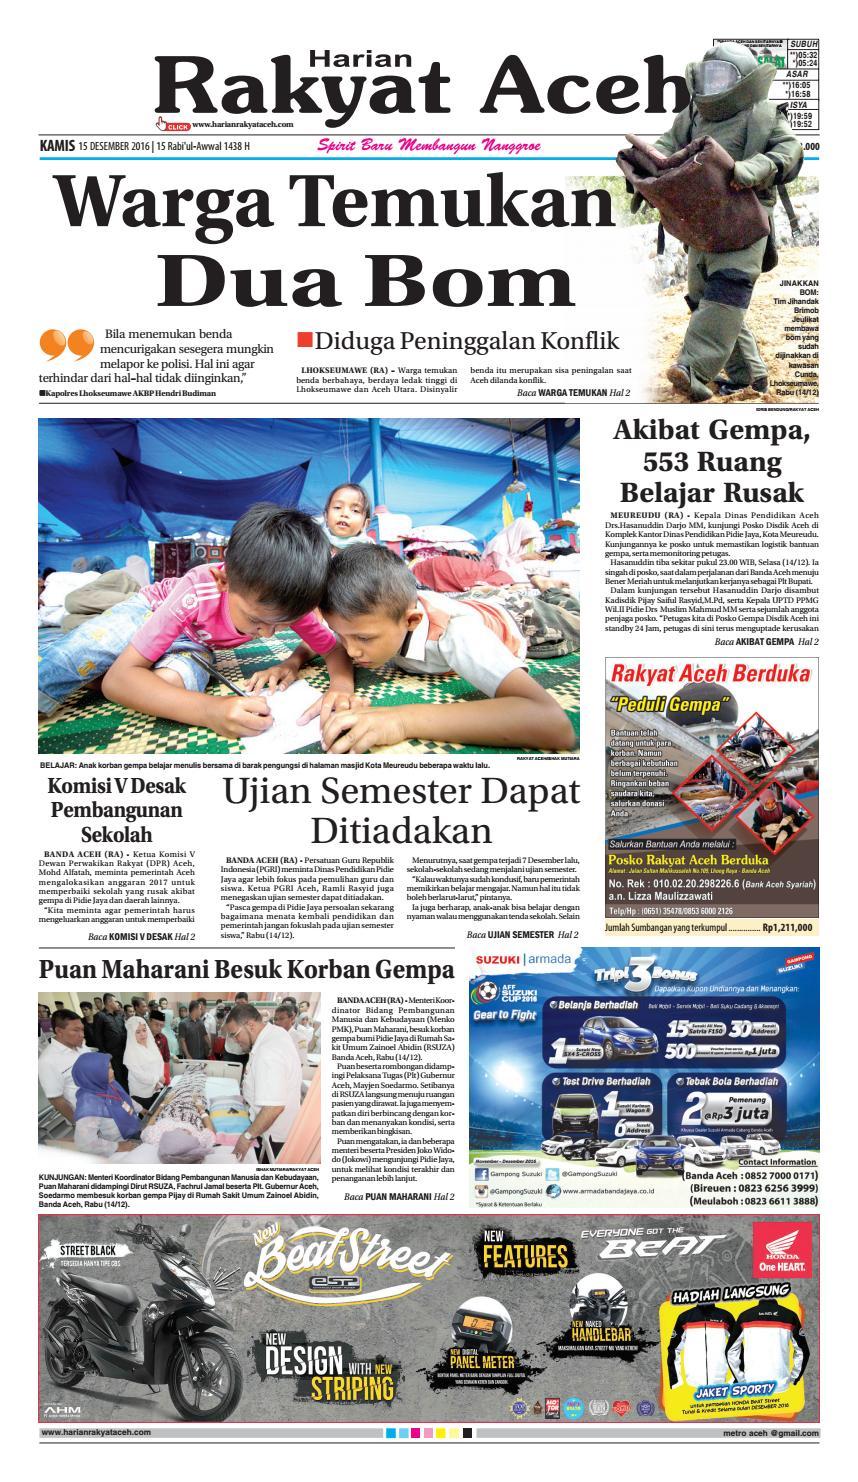 15 Decemberr 2016 By E Rakyat Aceh Issuu Produk Ukm Bumn Jamu Kunyit Asam Seger Waras